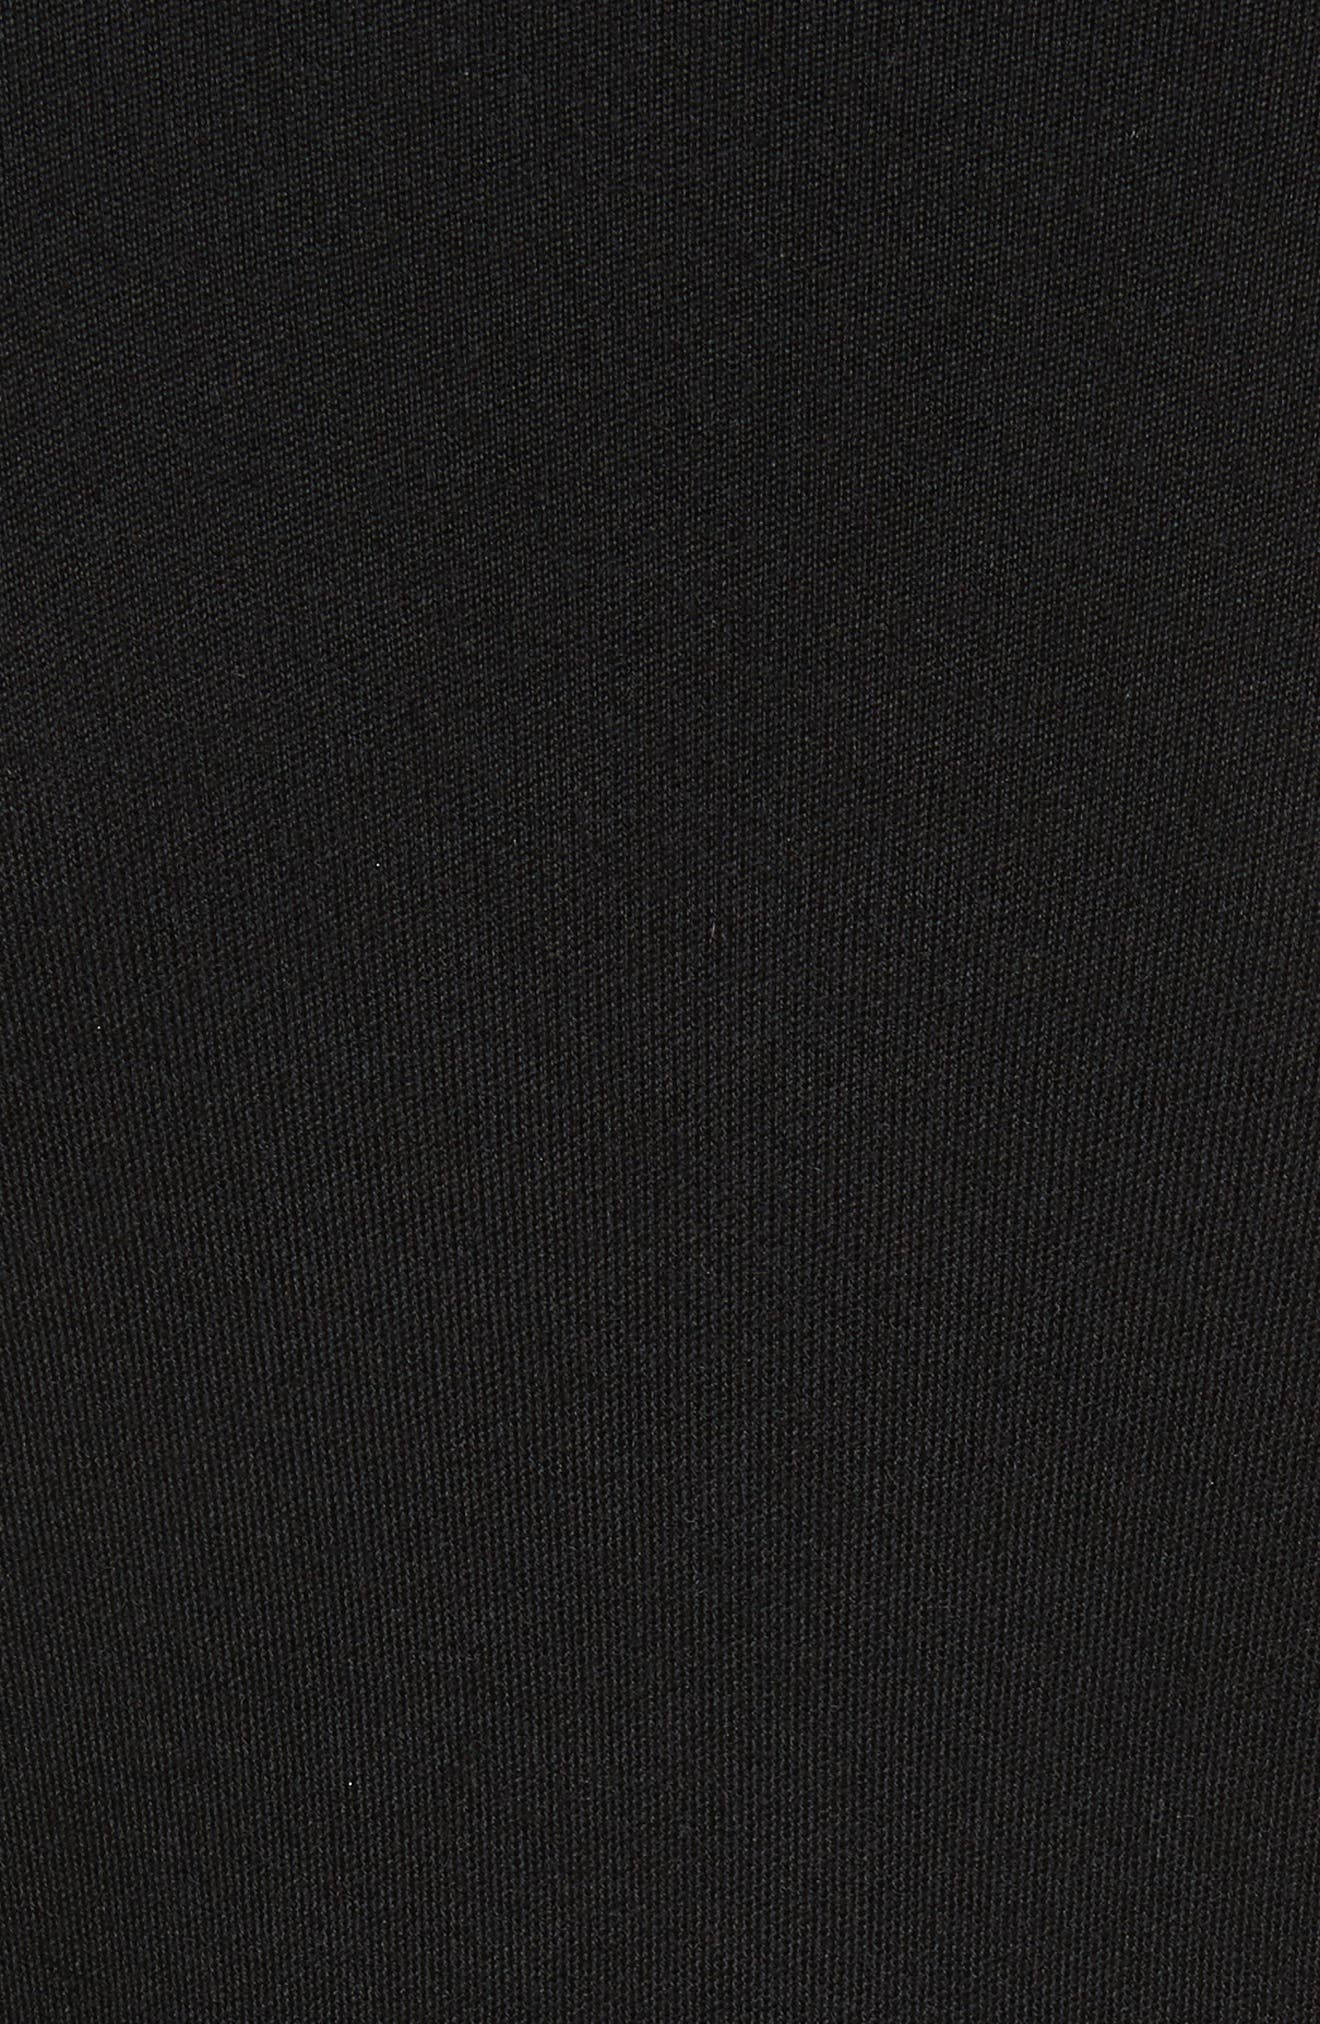 Cashmere Cardigan,                             Alternate thumbnail 5, color,                             Black